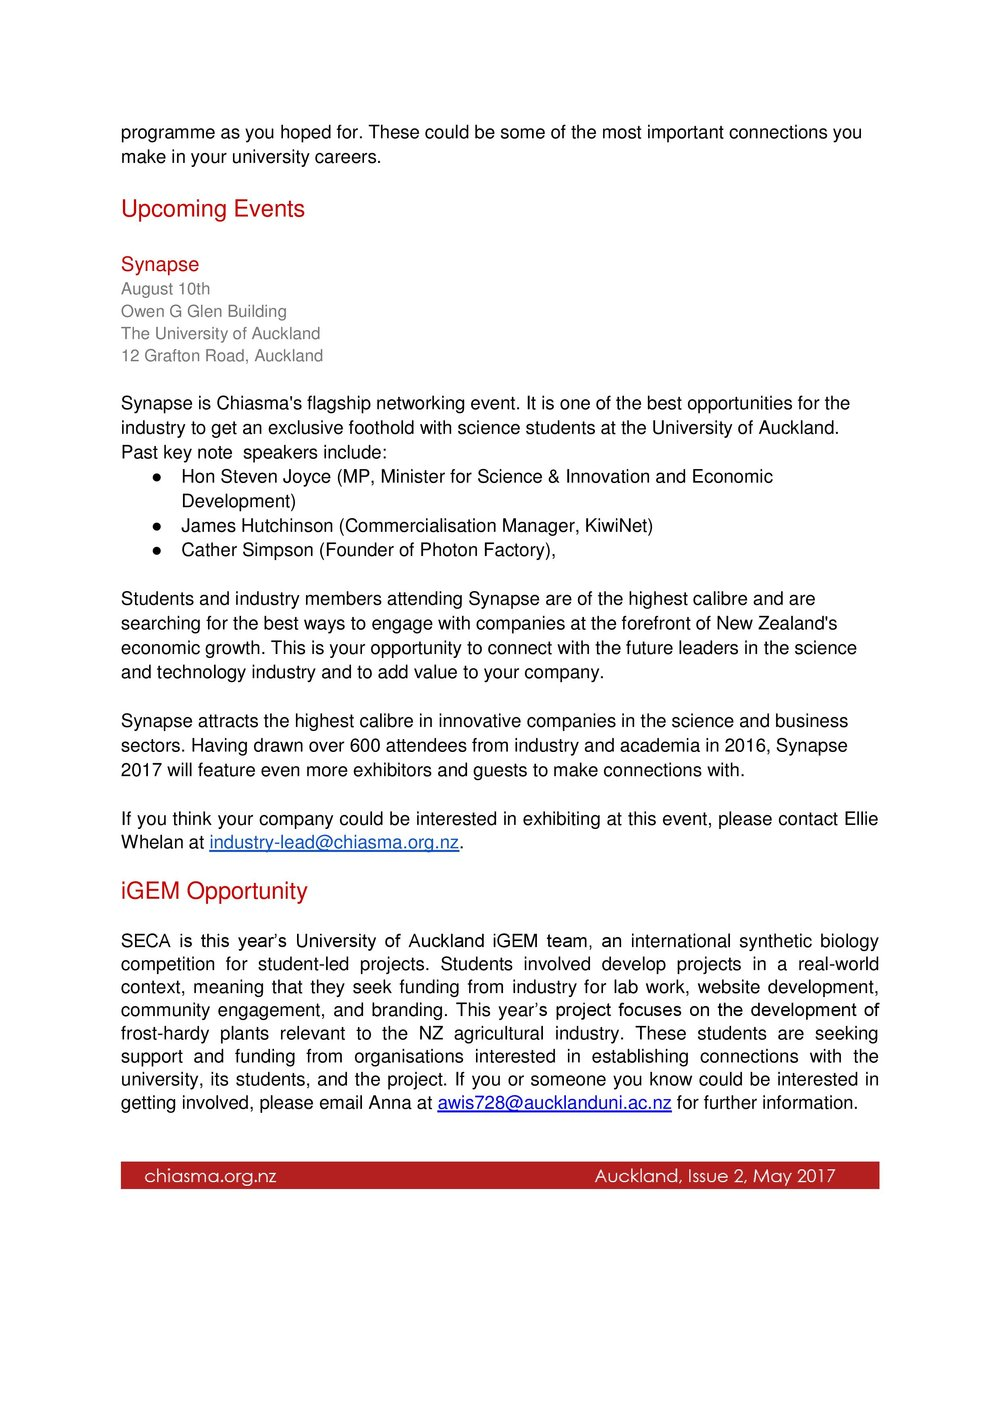 Newsletter2.docx-page-004.jpg